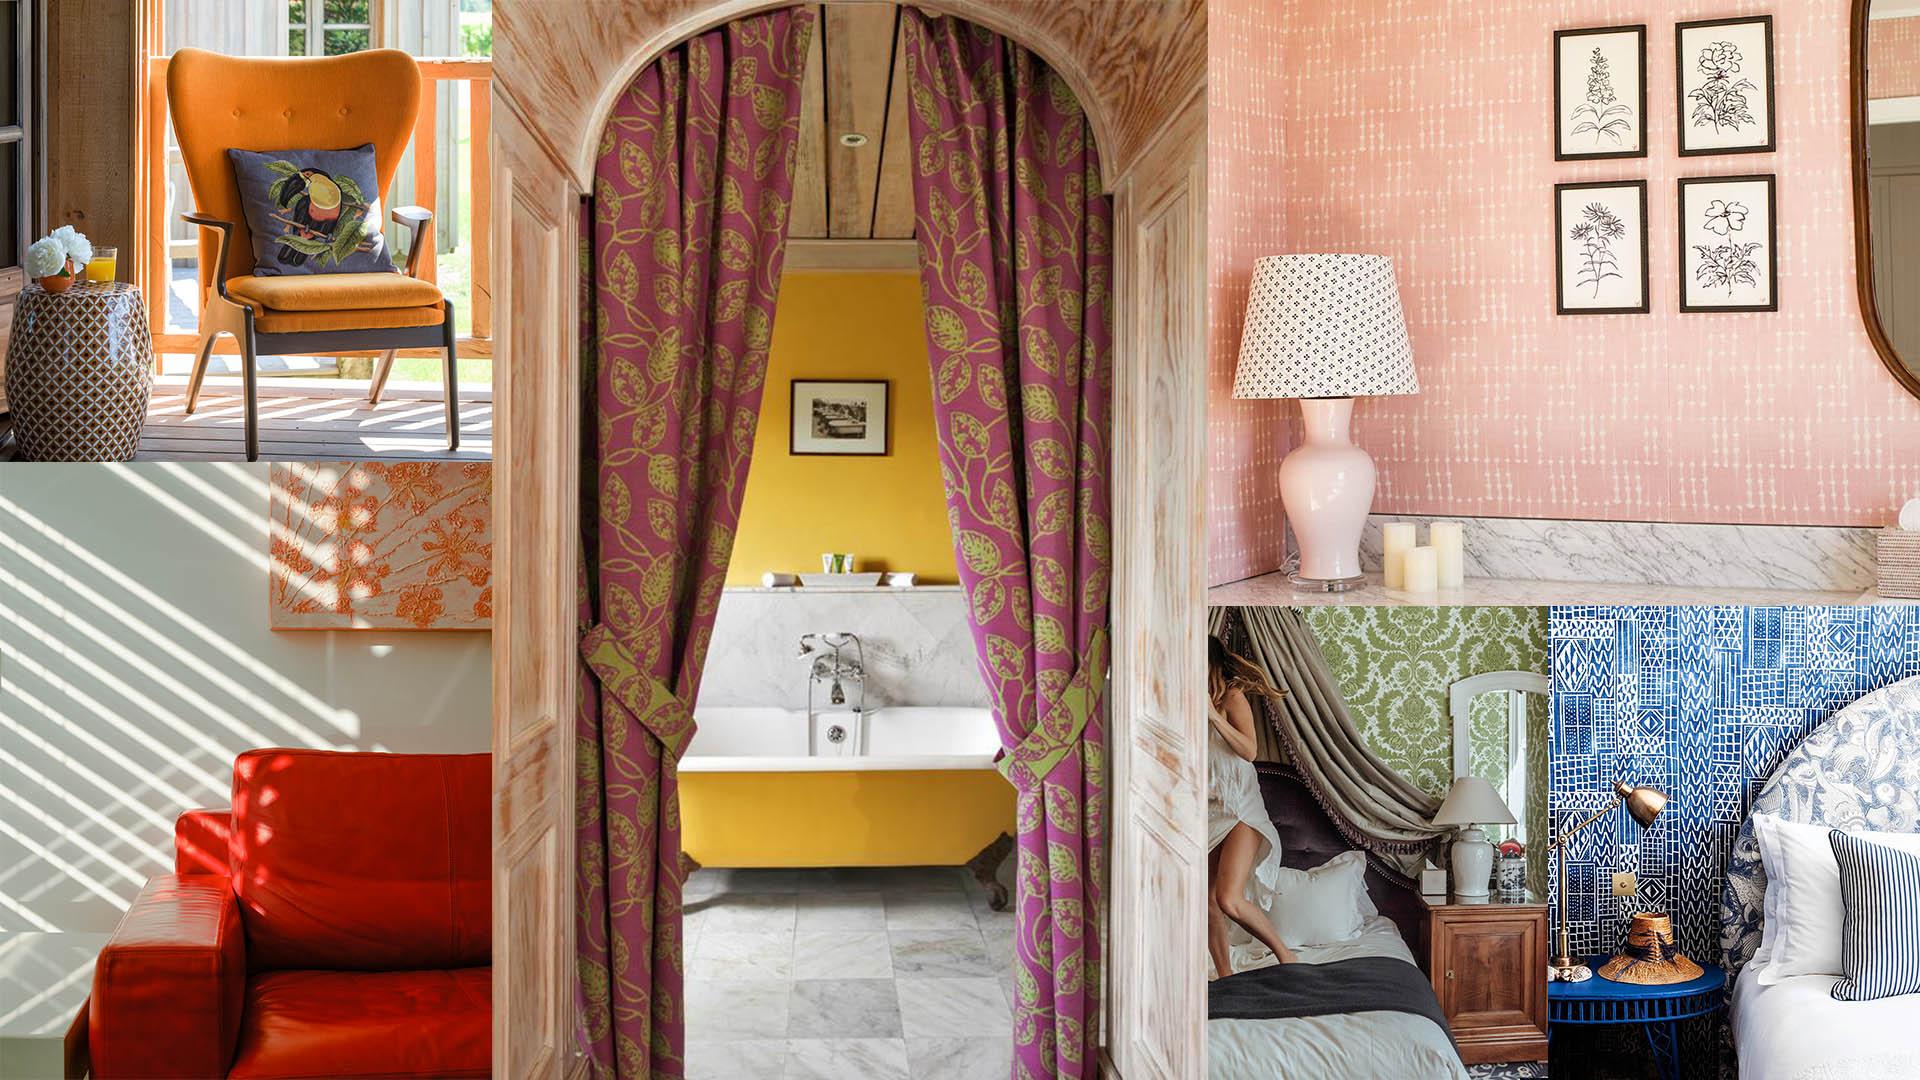 Interior inspiration: around the world in colour